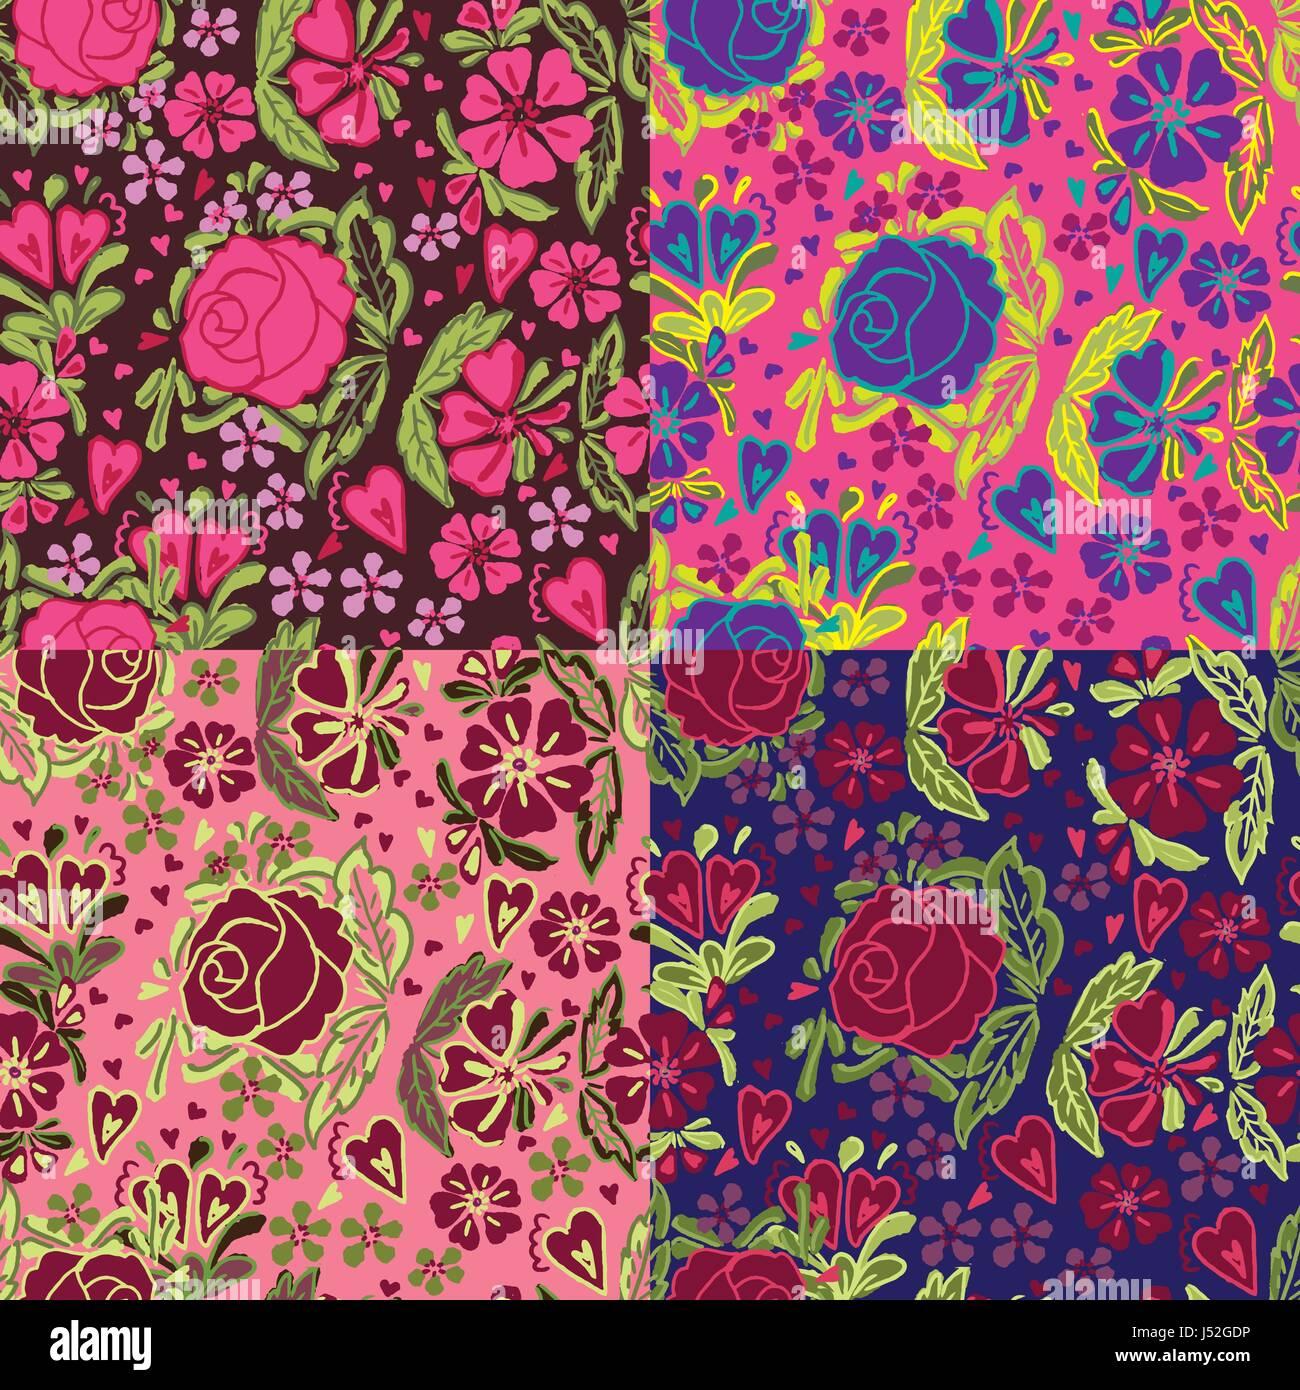 Traditional Floral Wallpaper Vector Illustration Stock Vector Art